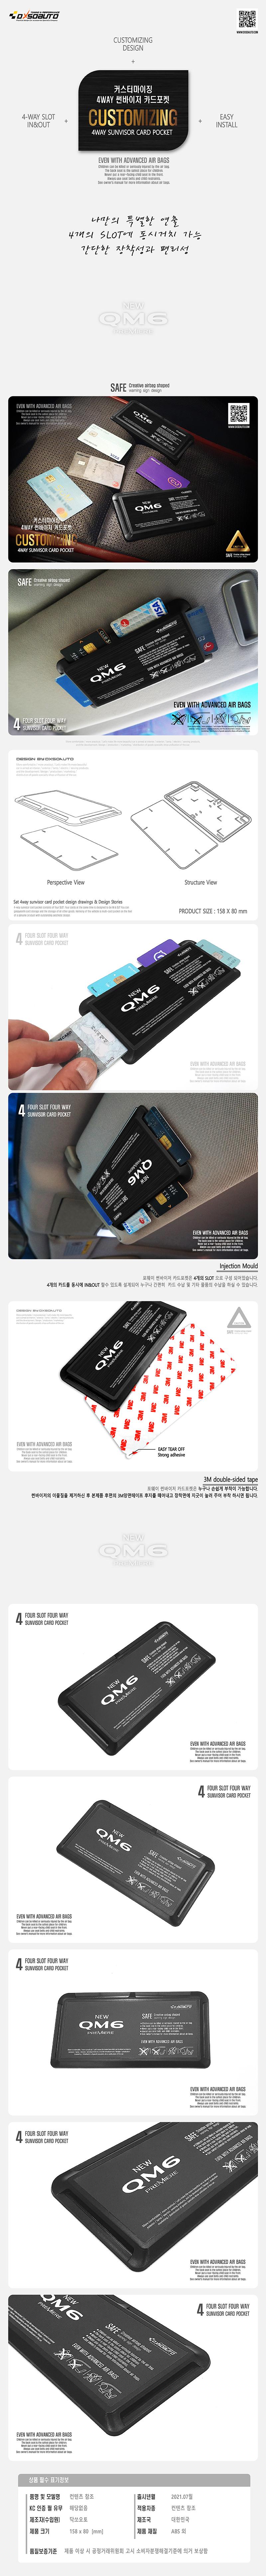 [DXSOAUTO] 커스터마이징 4WAY 썬바이저 카드포켓 (1EA / 1SET) 뉴 QM6 블랙